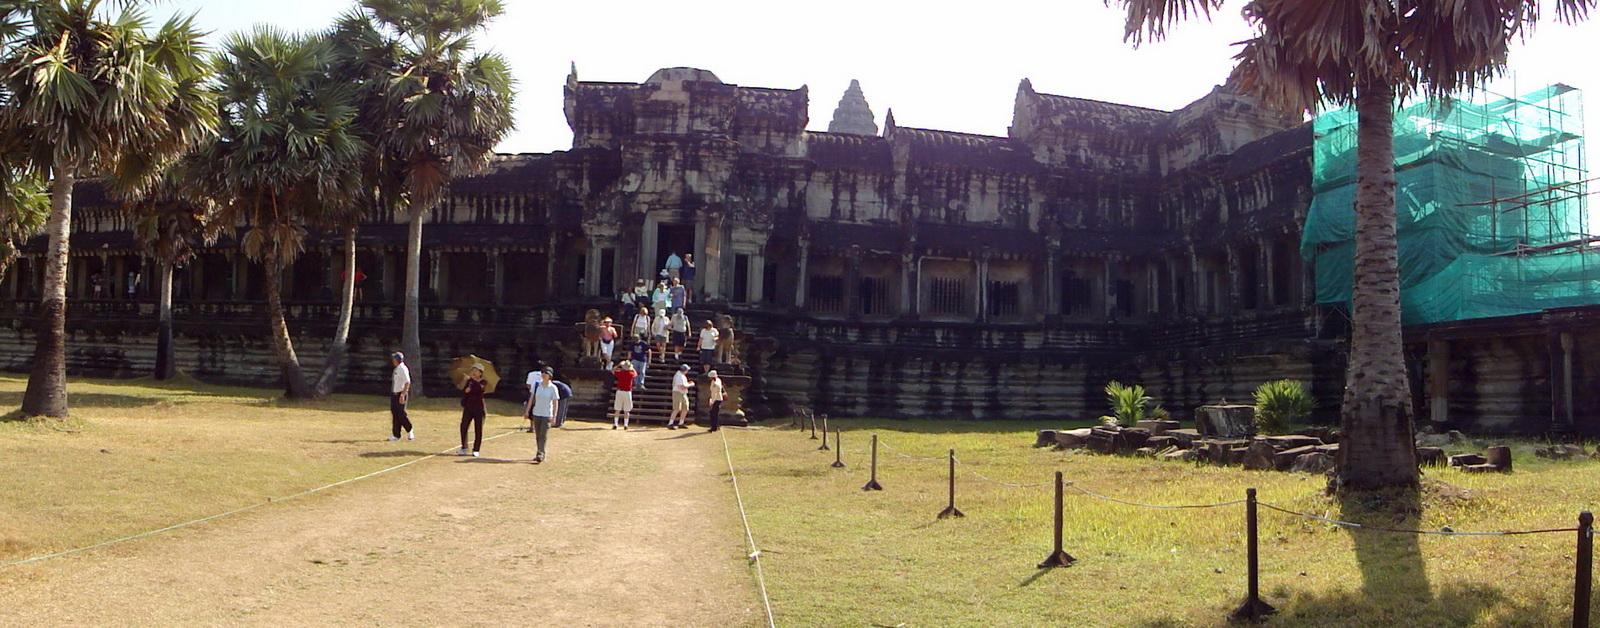 Angkor Wat west gallery entrance 01